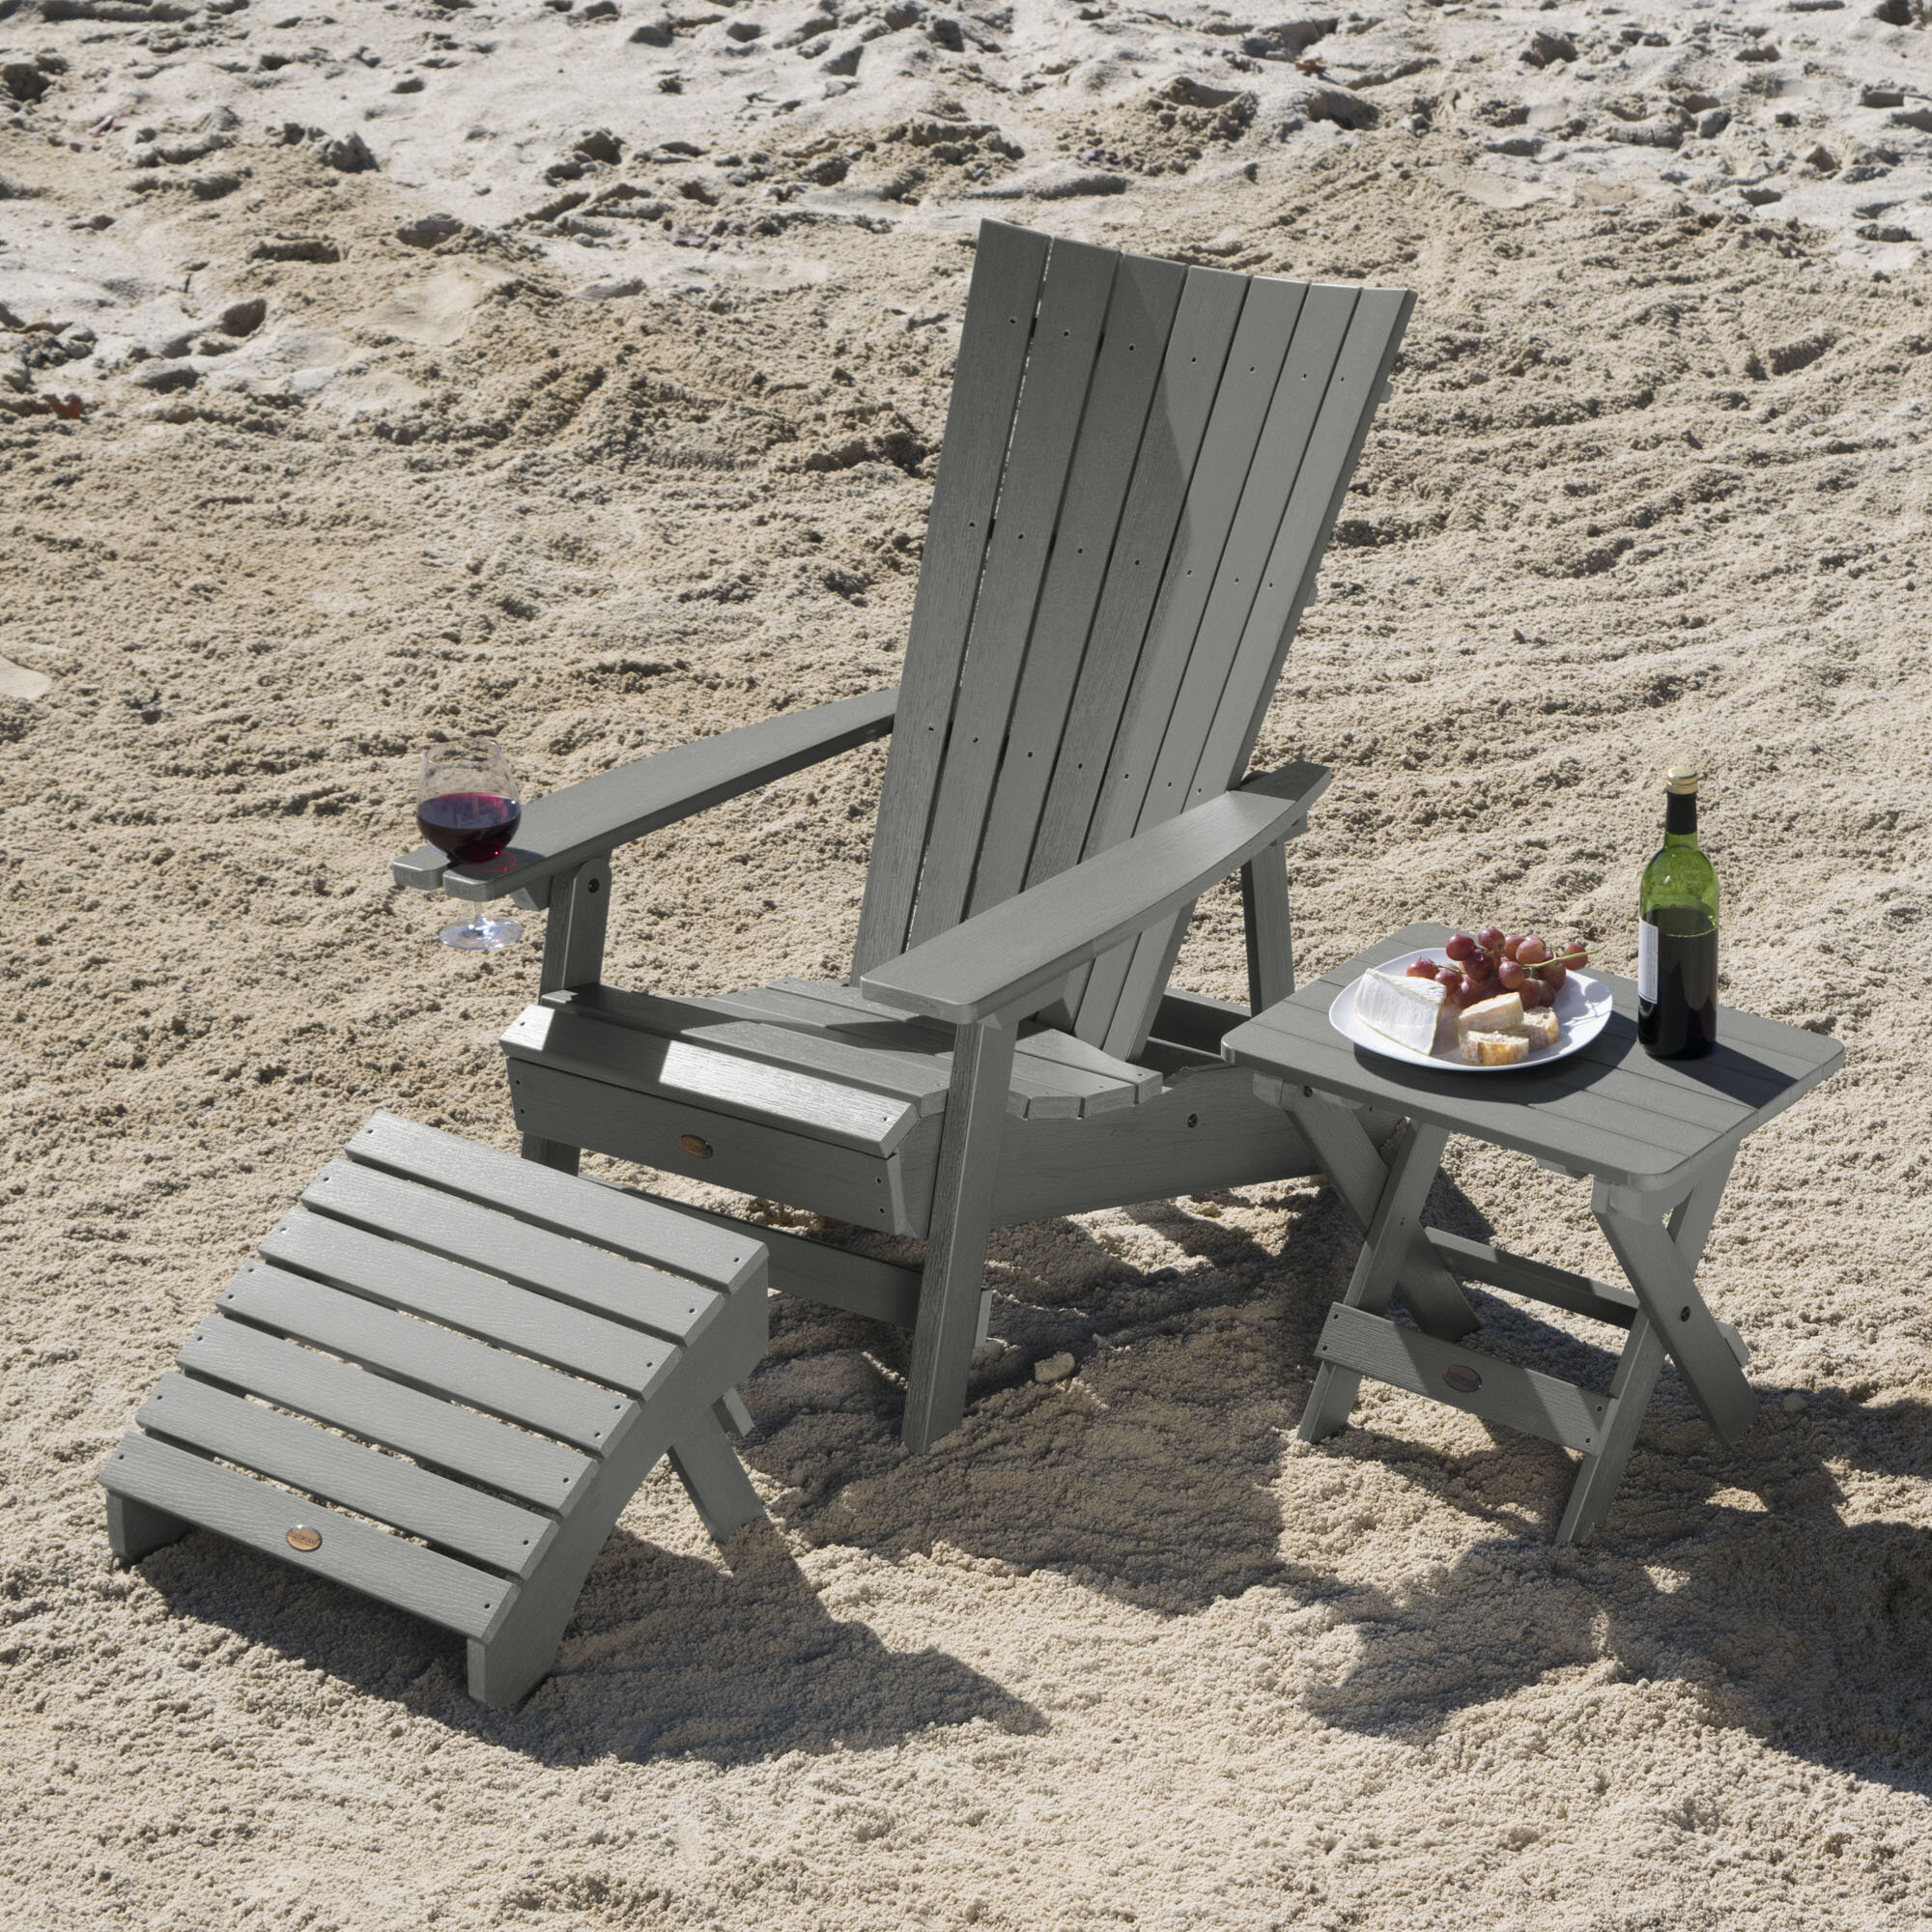 Breakwater bay deutsch plastic adirondack chair with table and ottoman wayfair